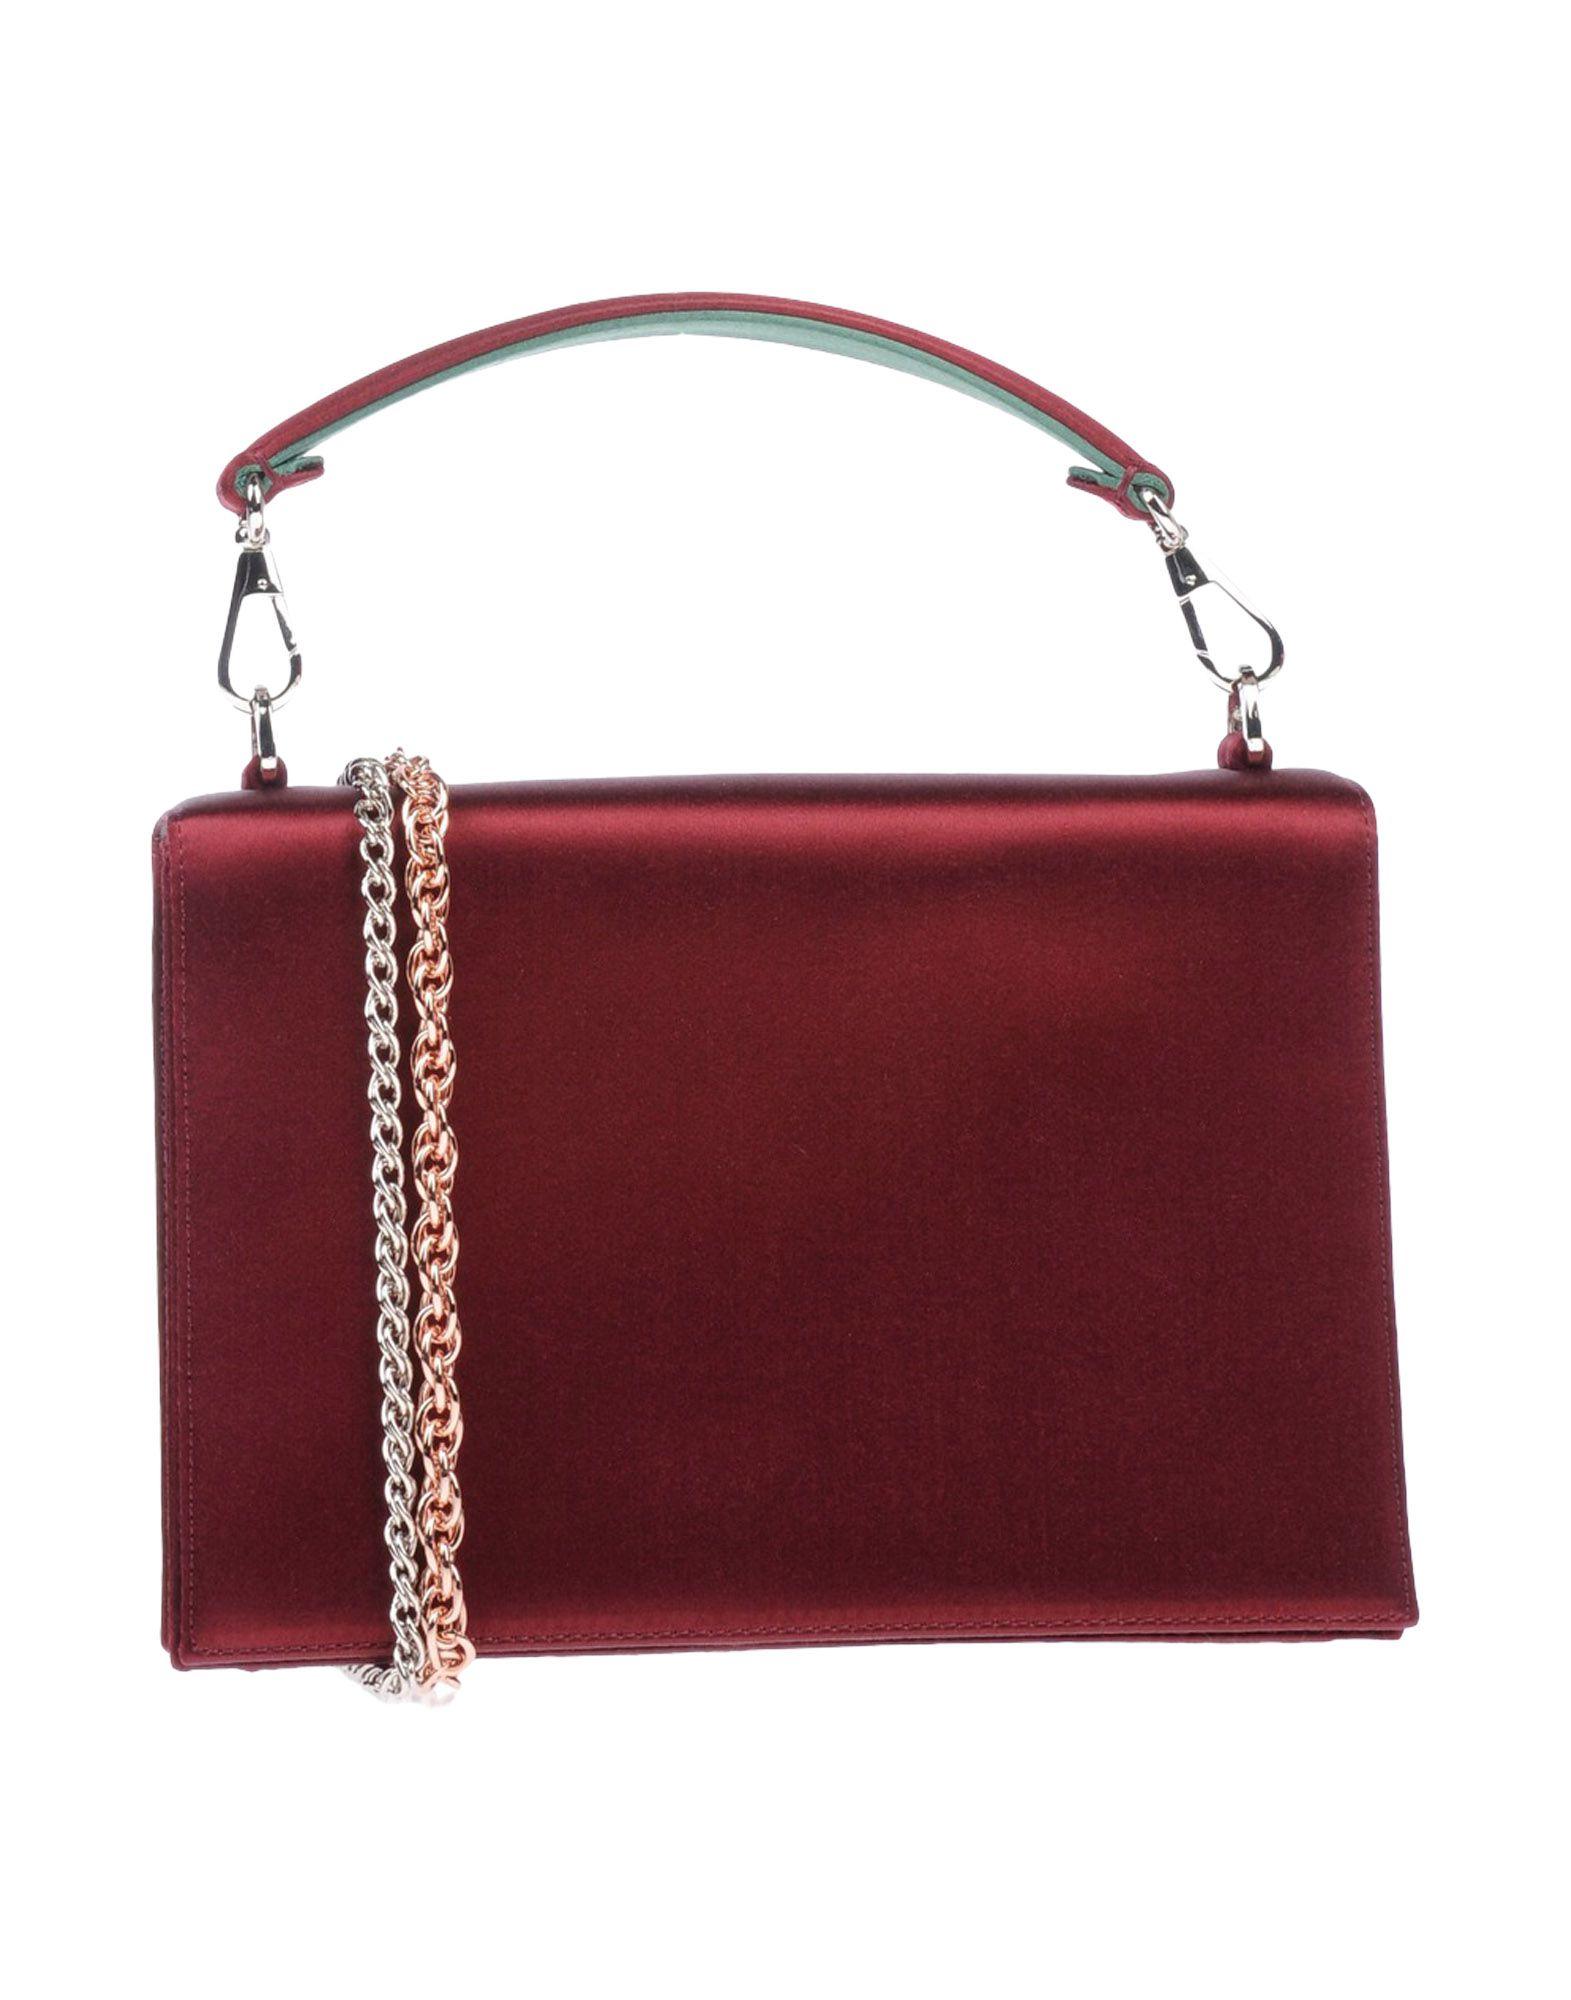 Costume National HANDBAGS - Handbags su YOOX.COM HCVXGDEHT